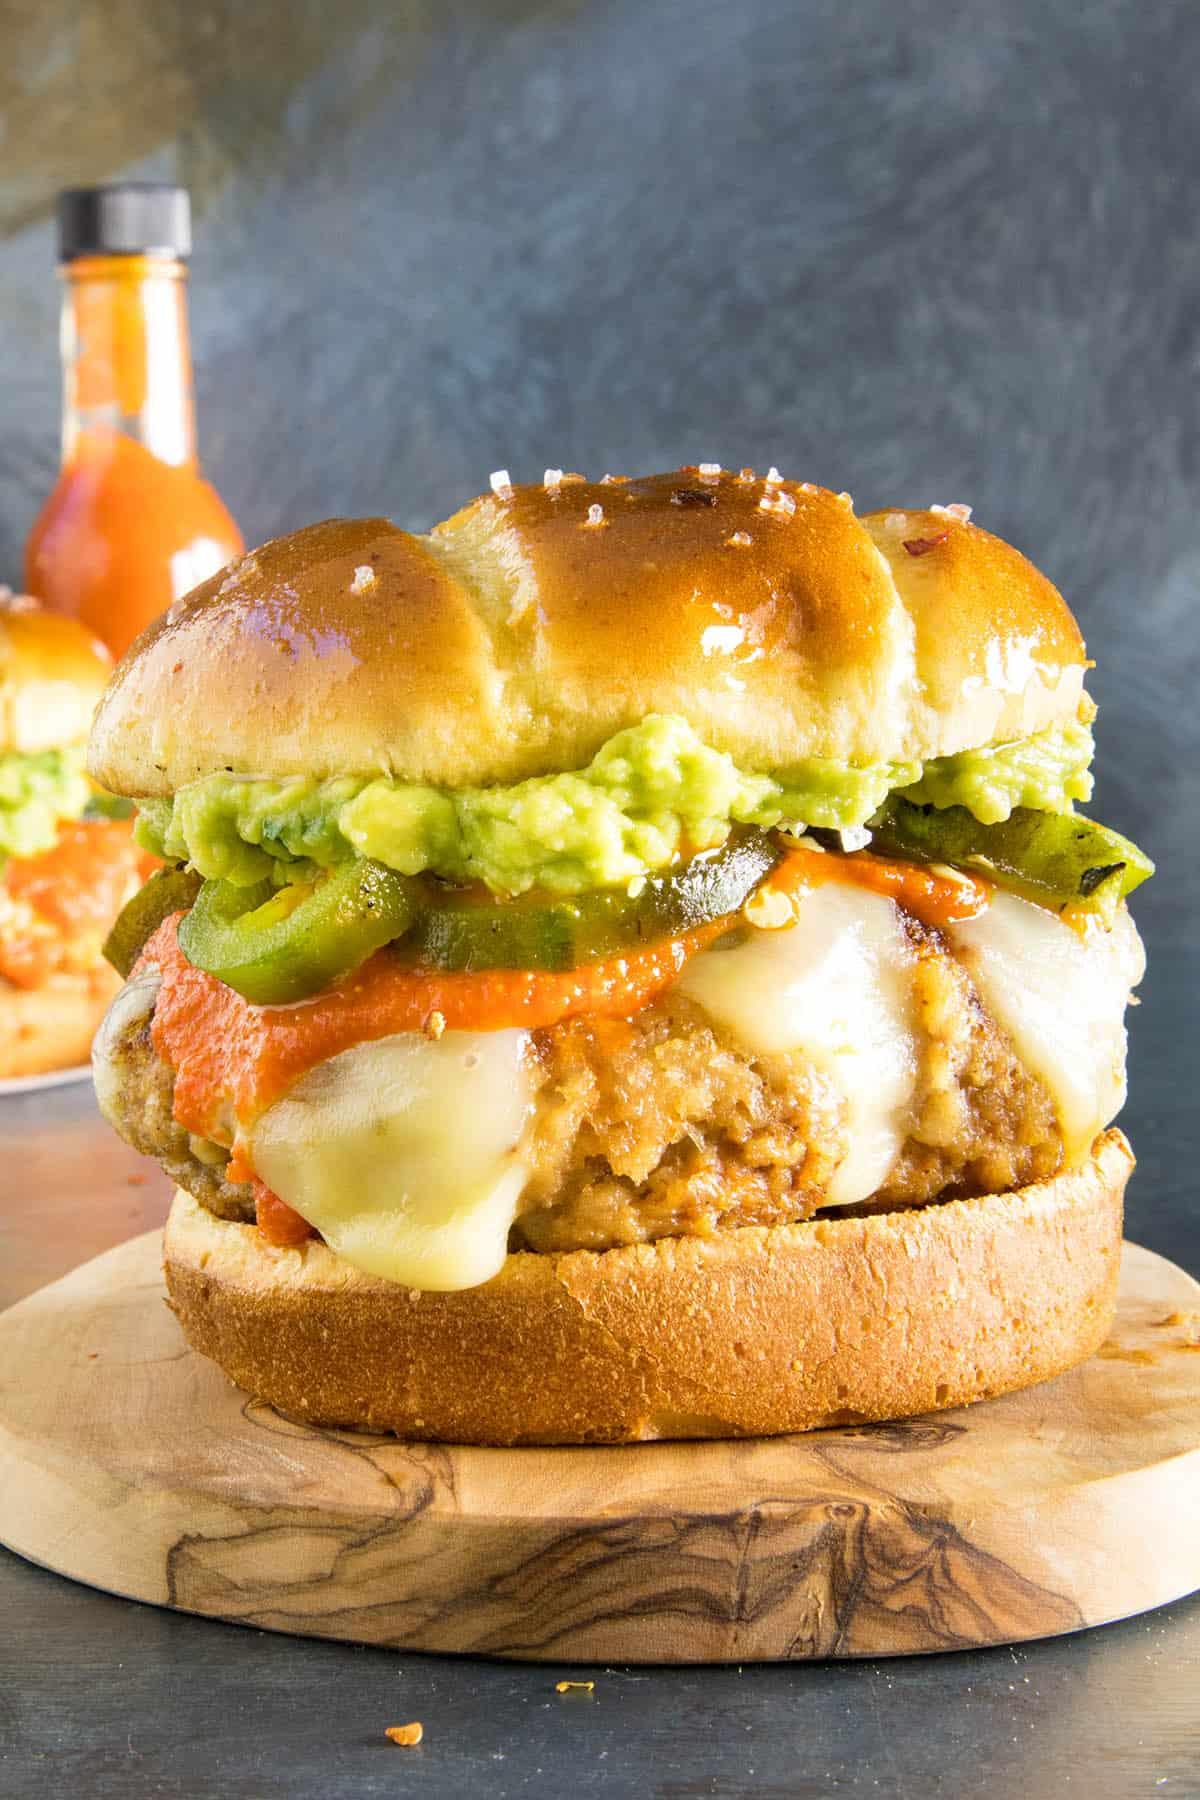 Guacamole Turkey Burgers - Ready to Eat!